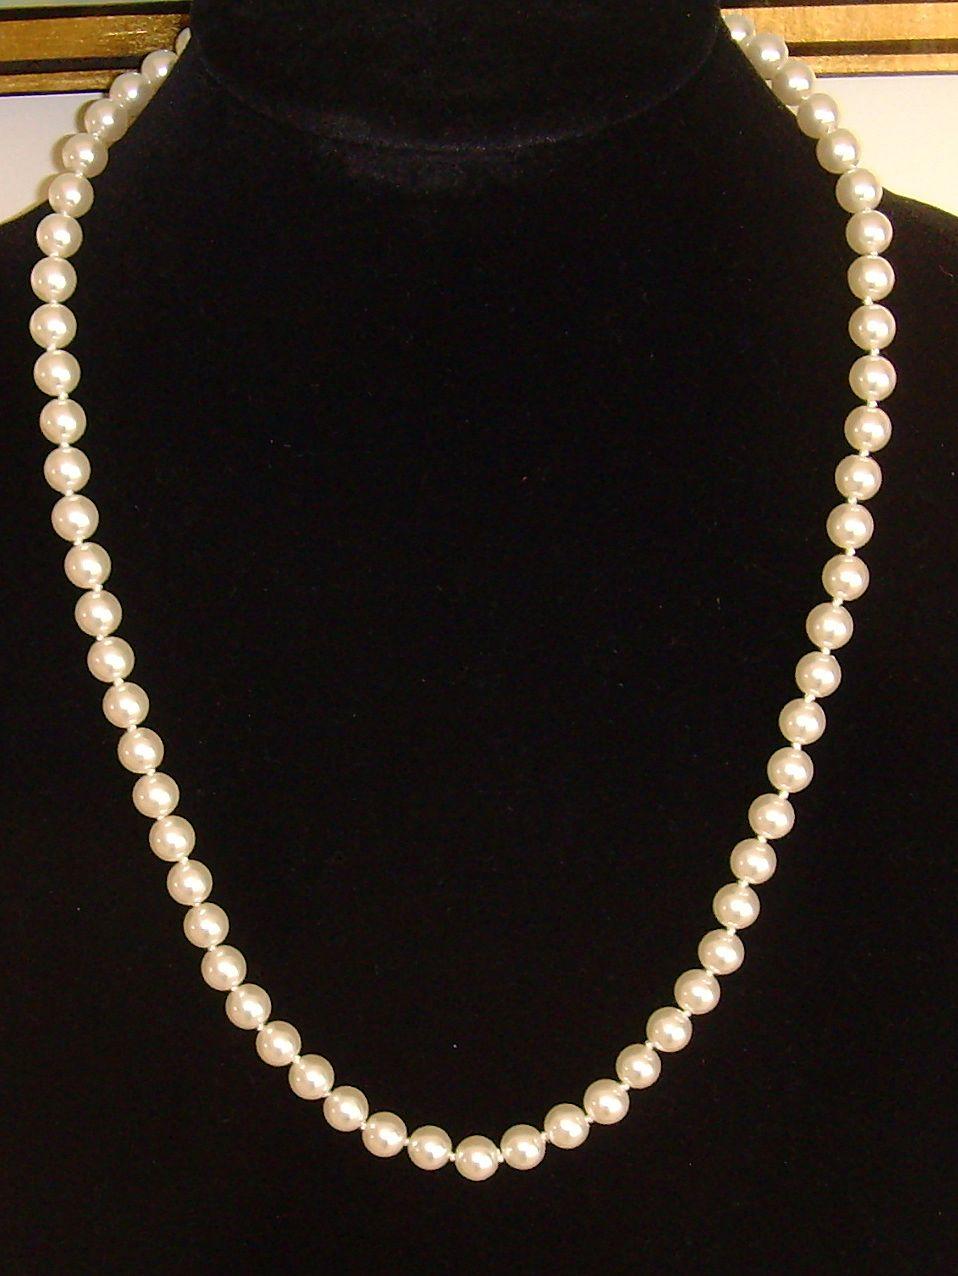 Simulated Single Strand Pearls